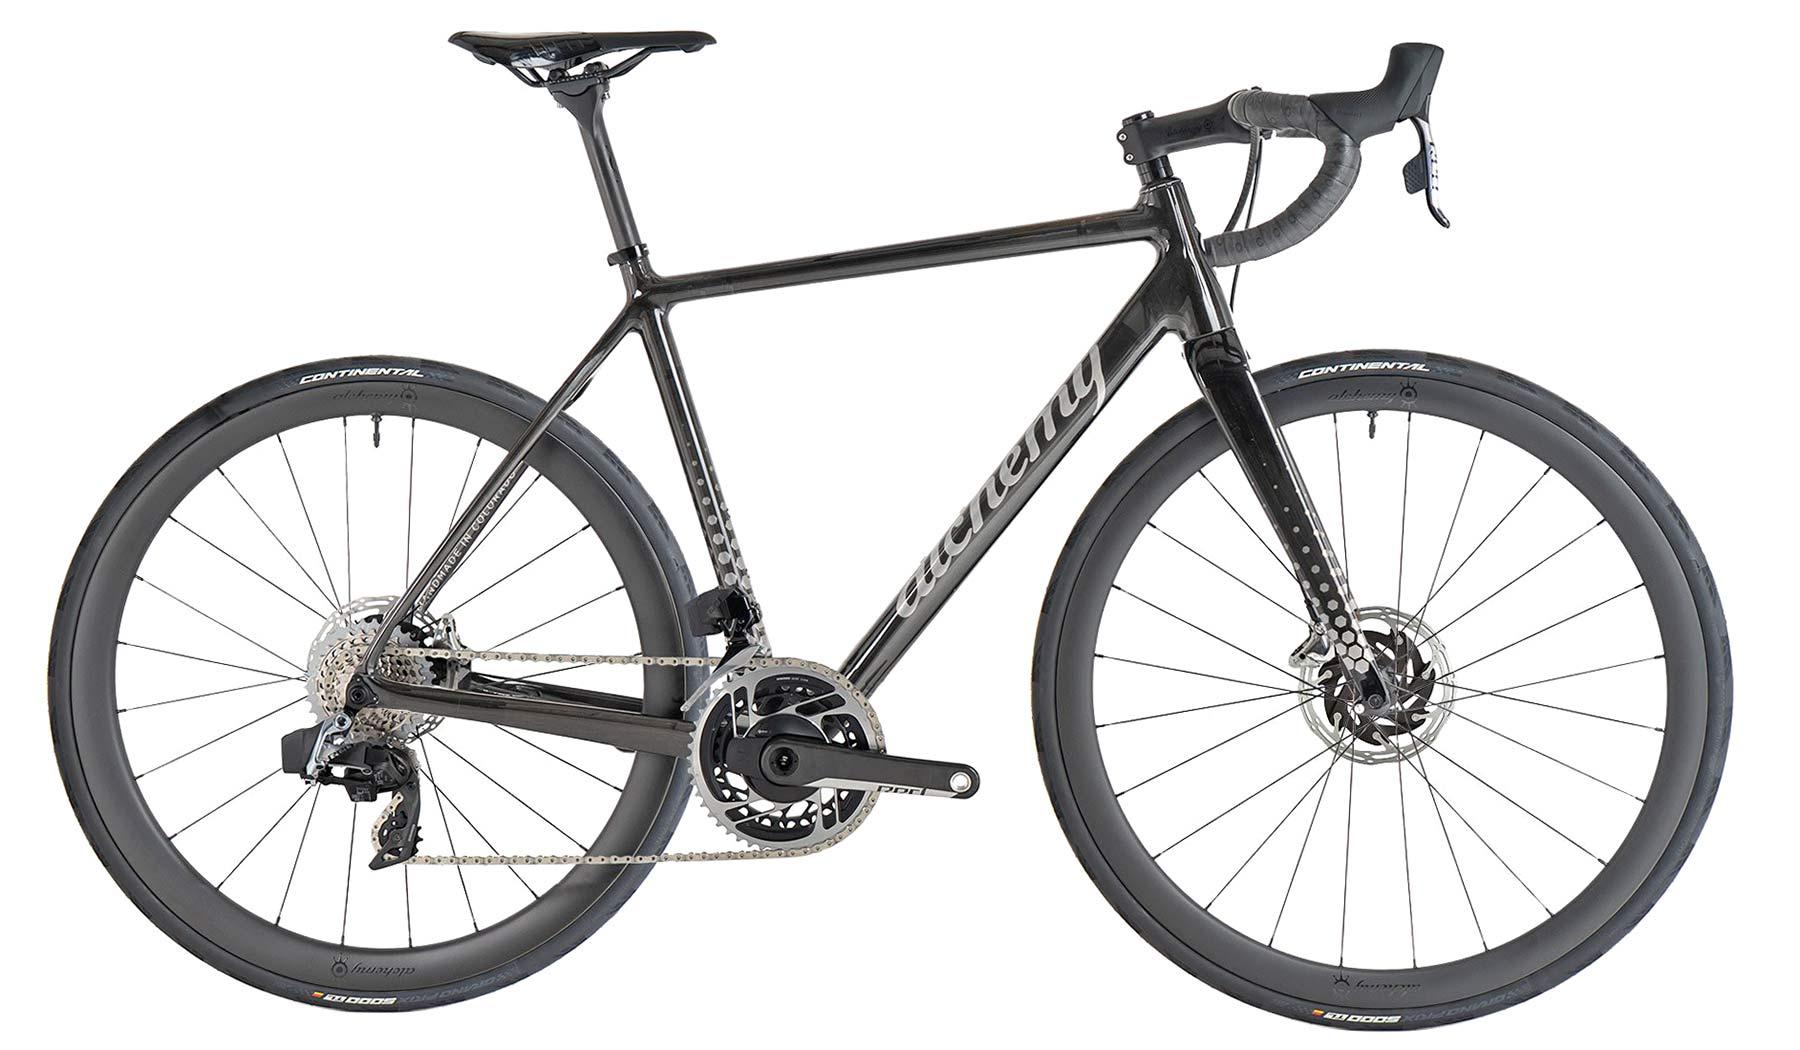 2021 Alchemy Atlas custom carbon or titanium all-road bikes,road